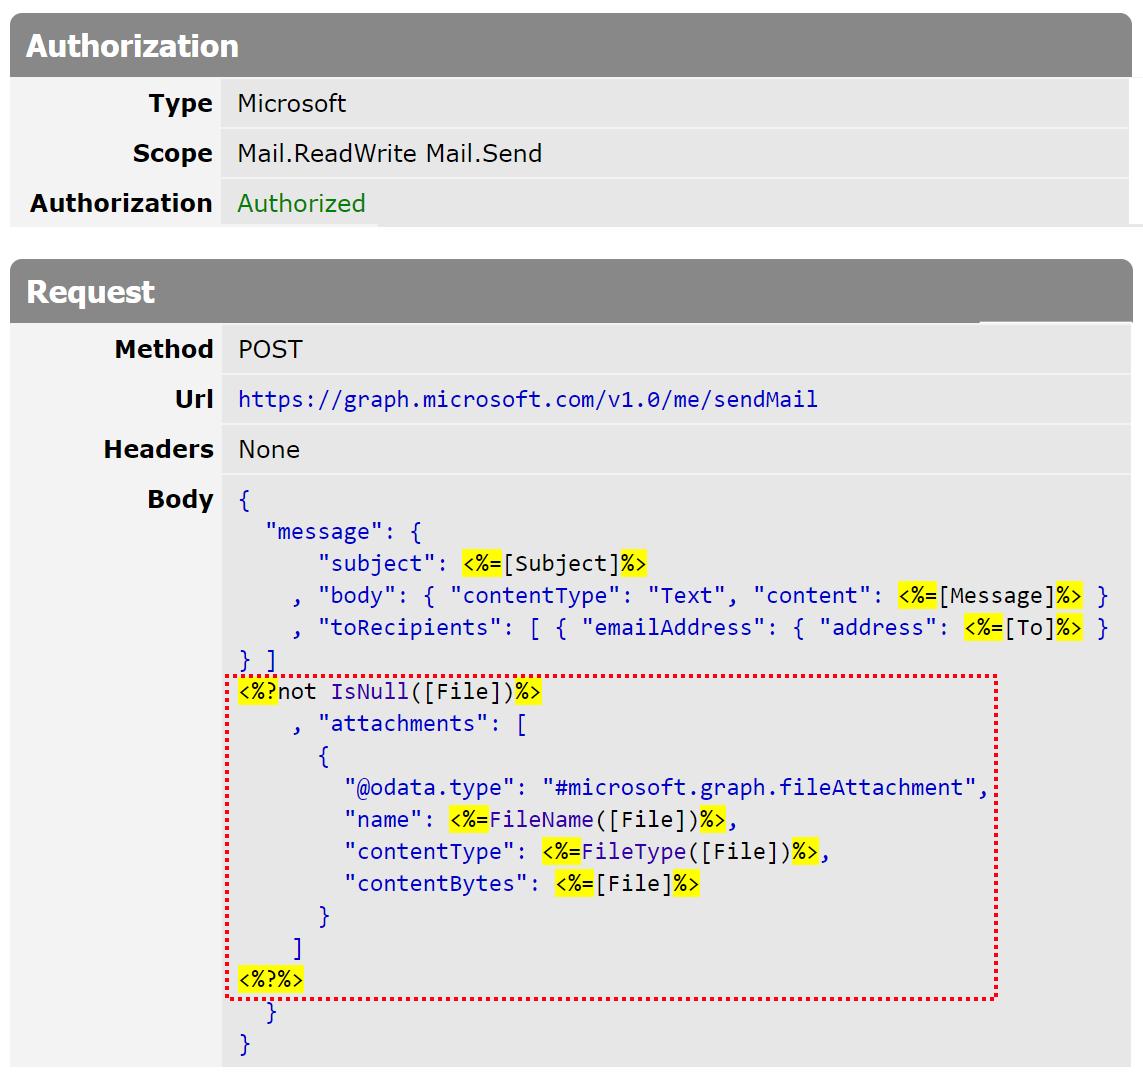 File upload in JSON body